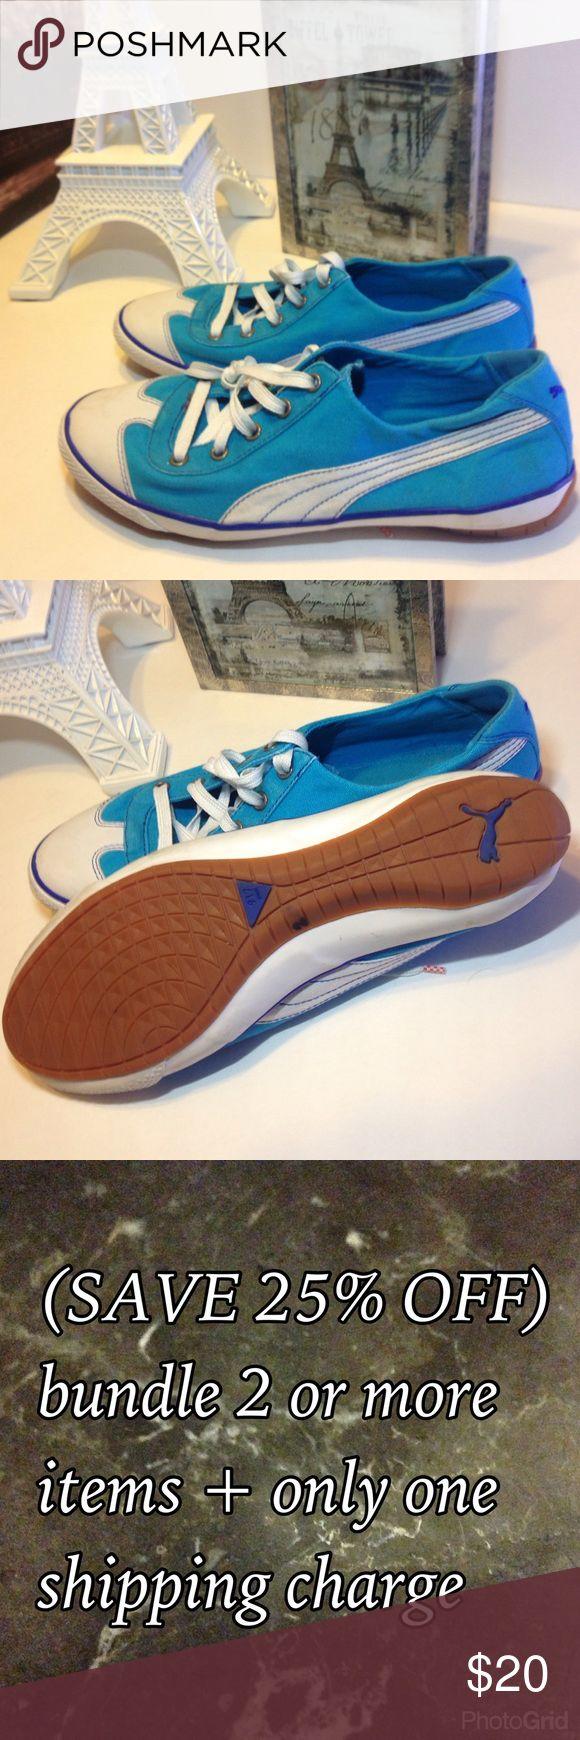 Puma 😼 ladies tennis shoes sneakers blue size 7.5 Puma 😼 ladies tennis shoes sneakers blue size 7.5 Puma Shoes Sneakers